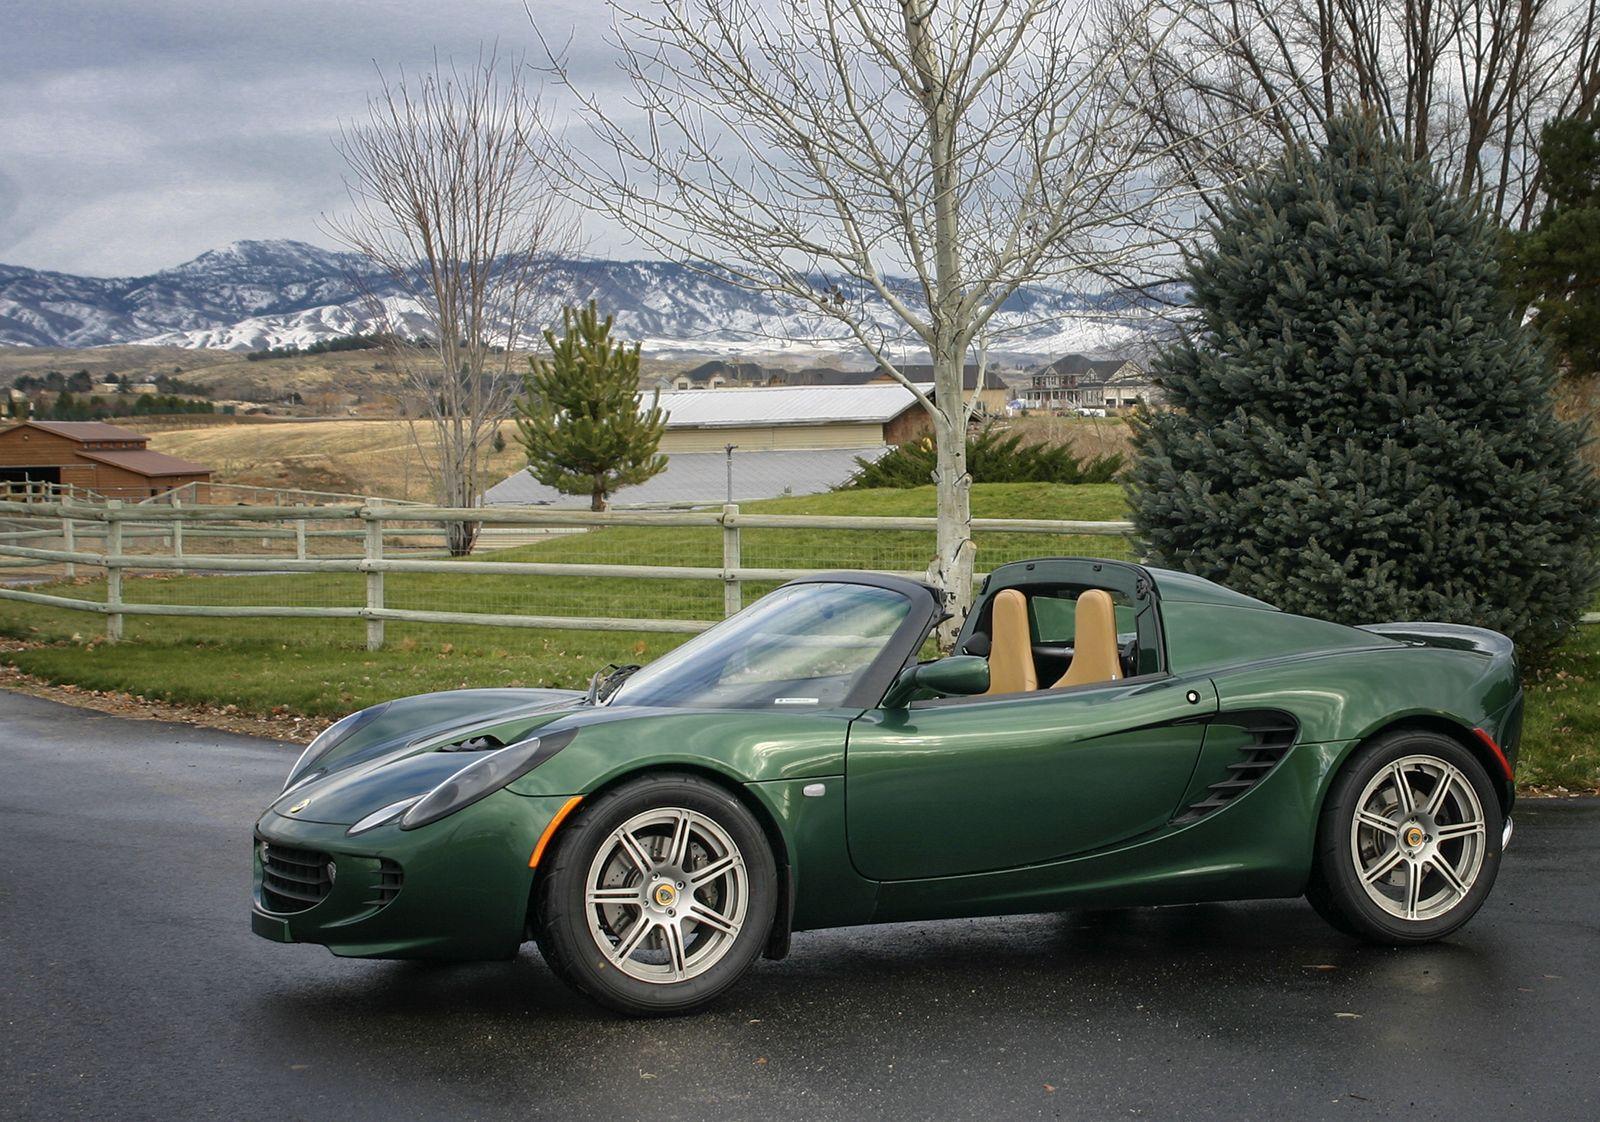 Lotus Elise In Proper British Racing Green